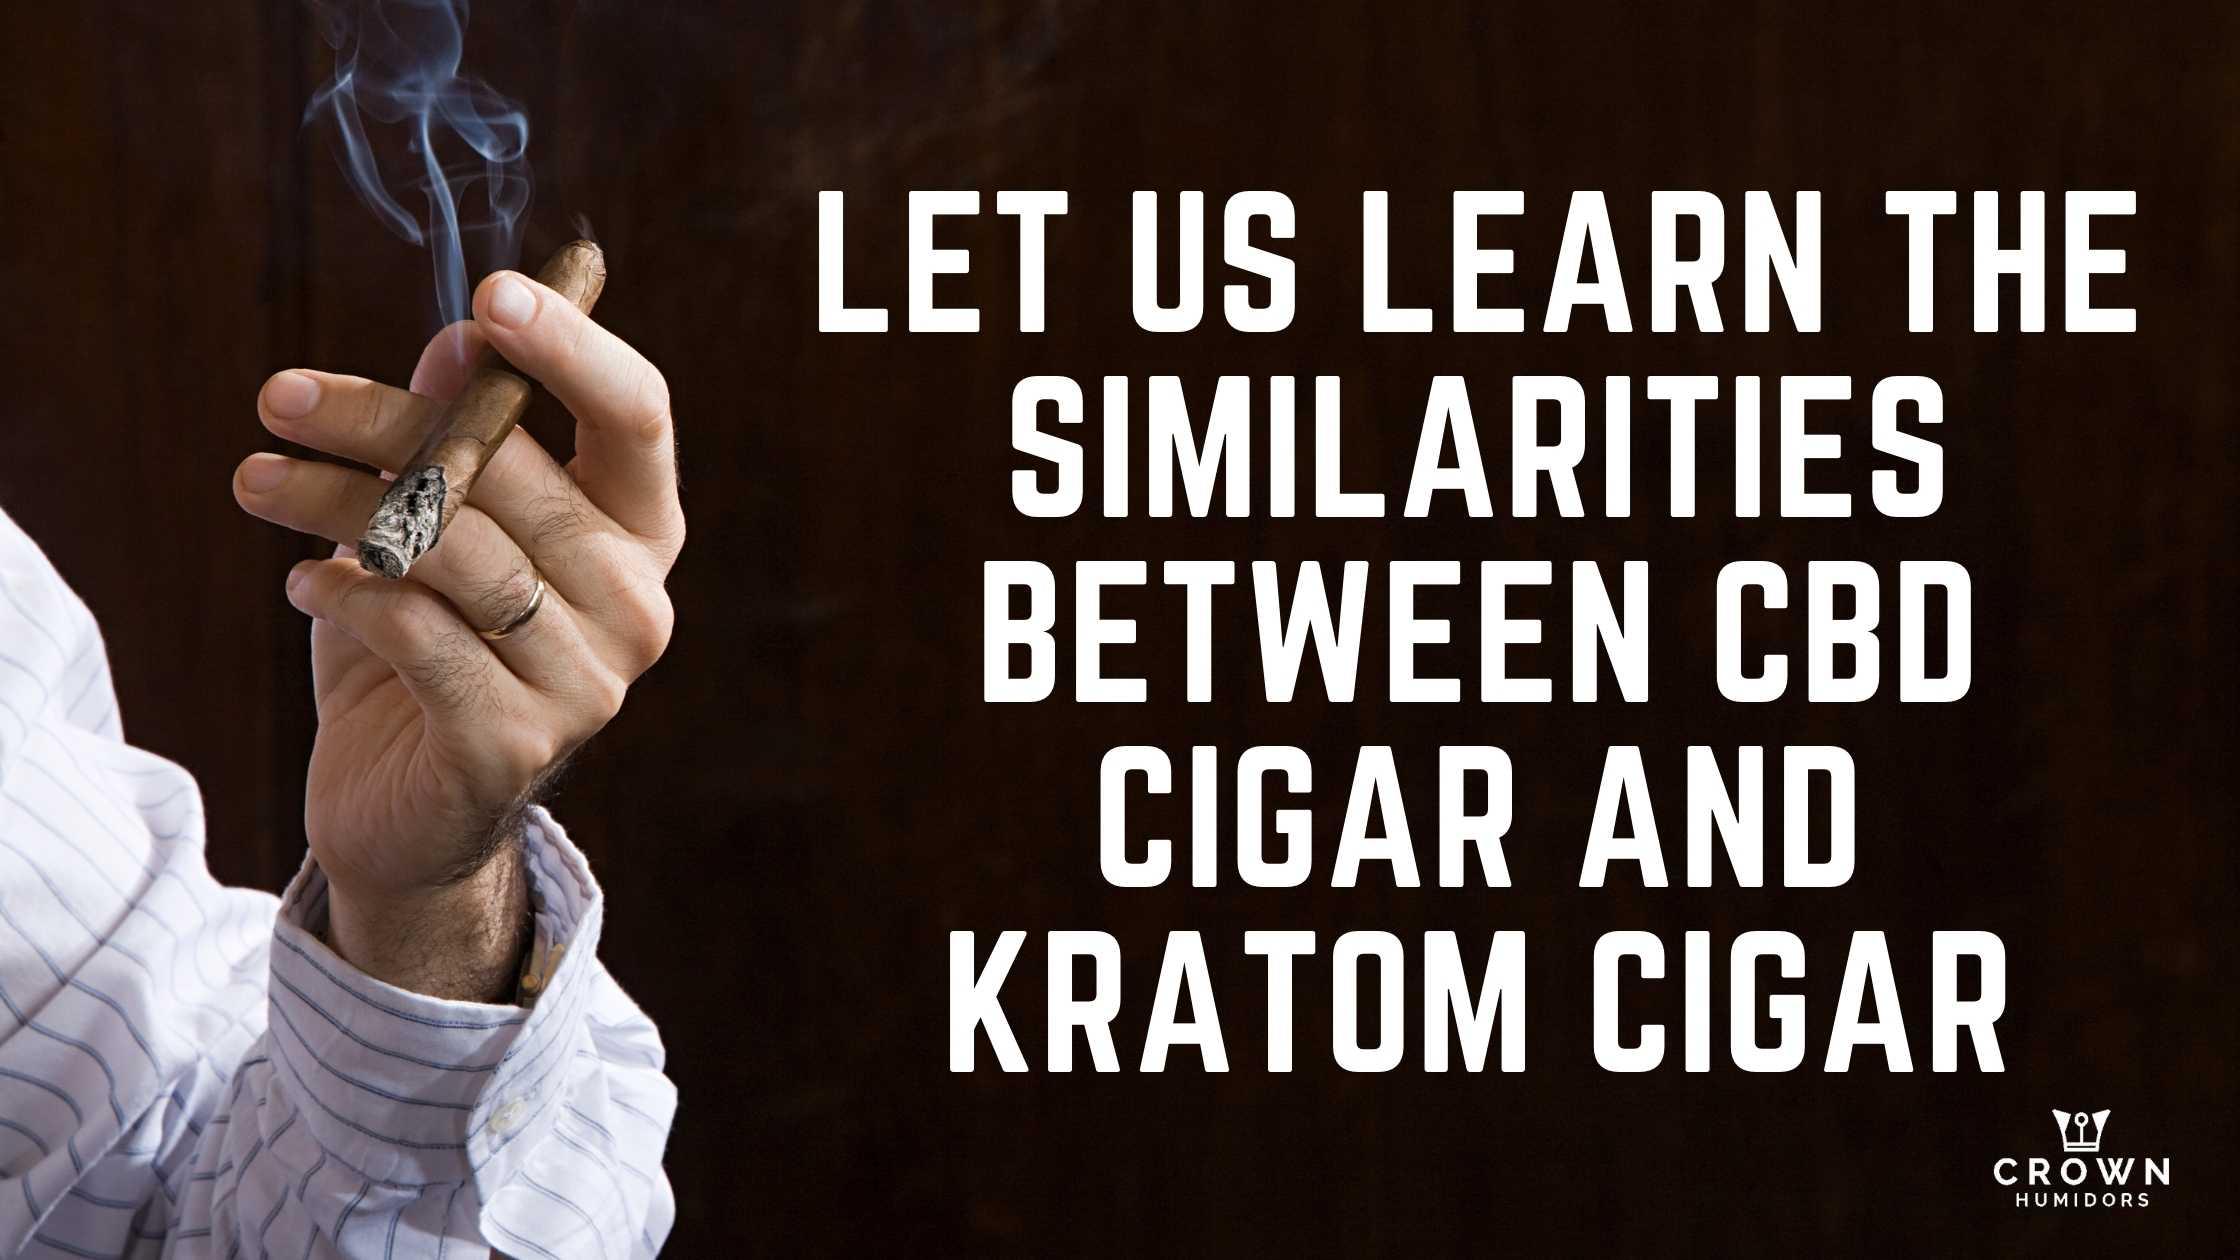 LET US LEARN THE SIMILARITIES BETWEEN CBD CIGAR AND KRATOM CIGAR